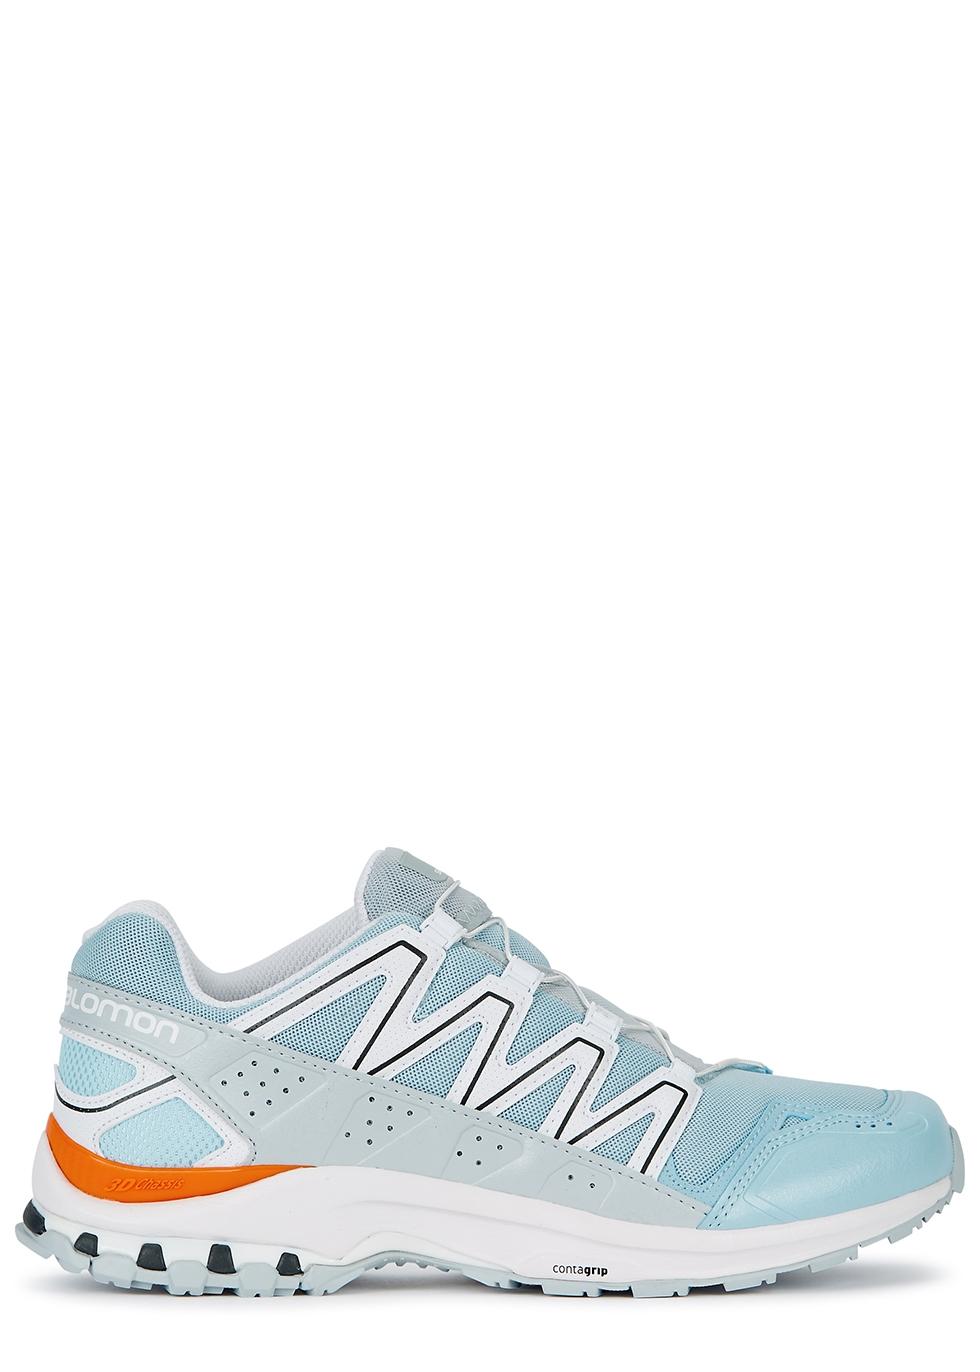 XA-COMP ADV blue mesh sneakers